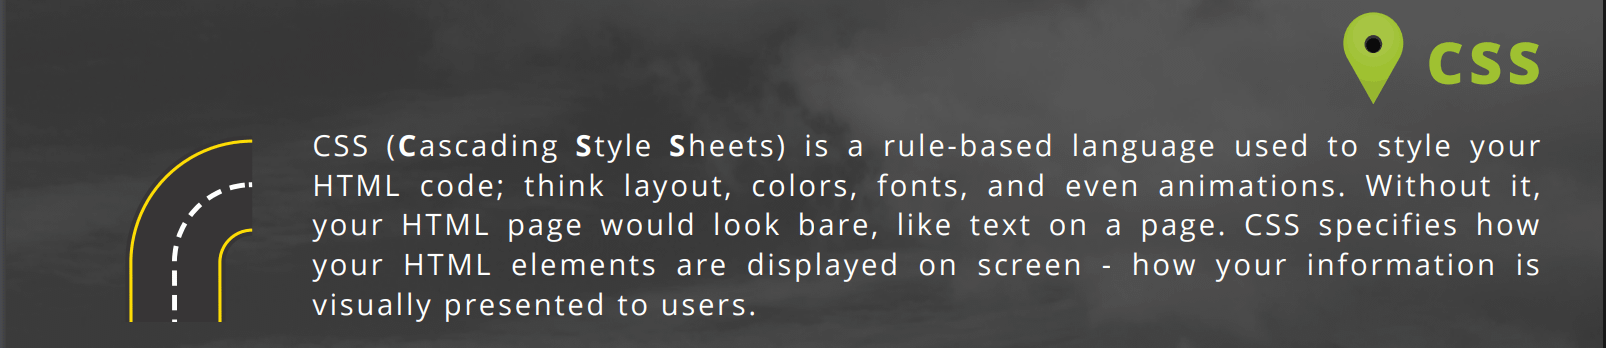 CSS excerpt from roadmap